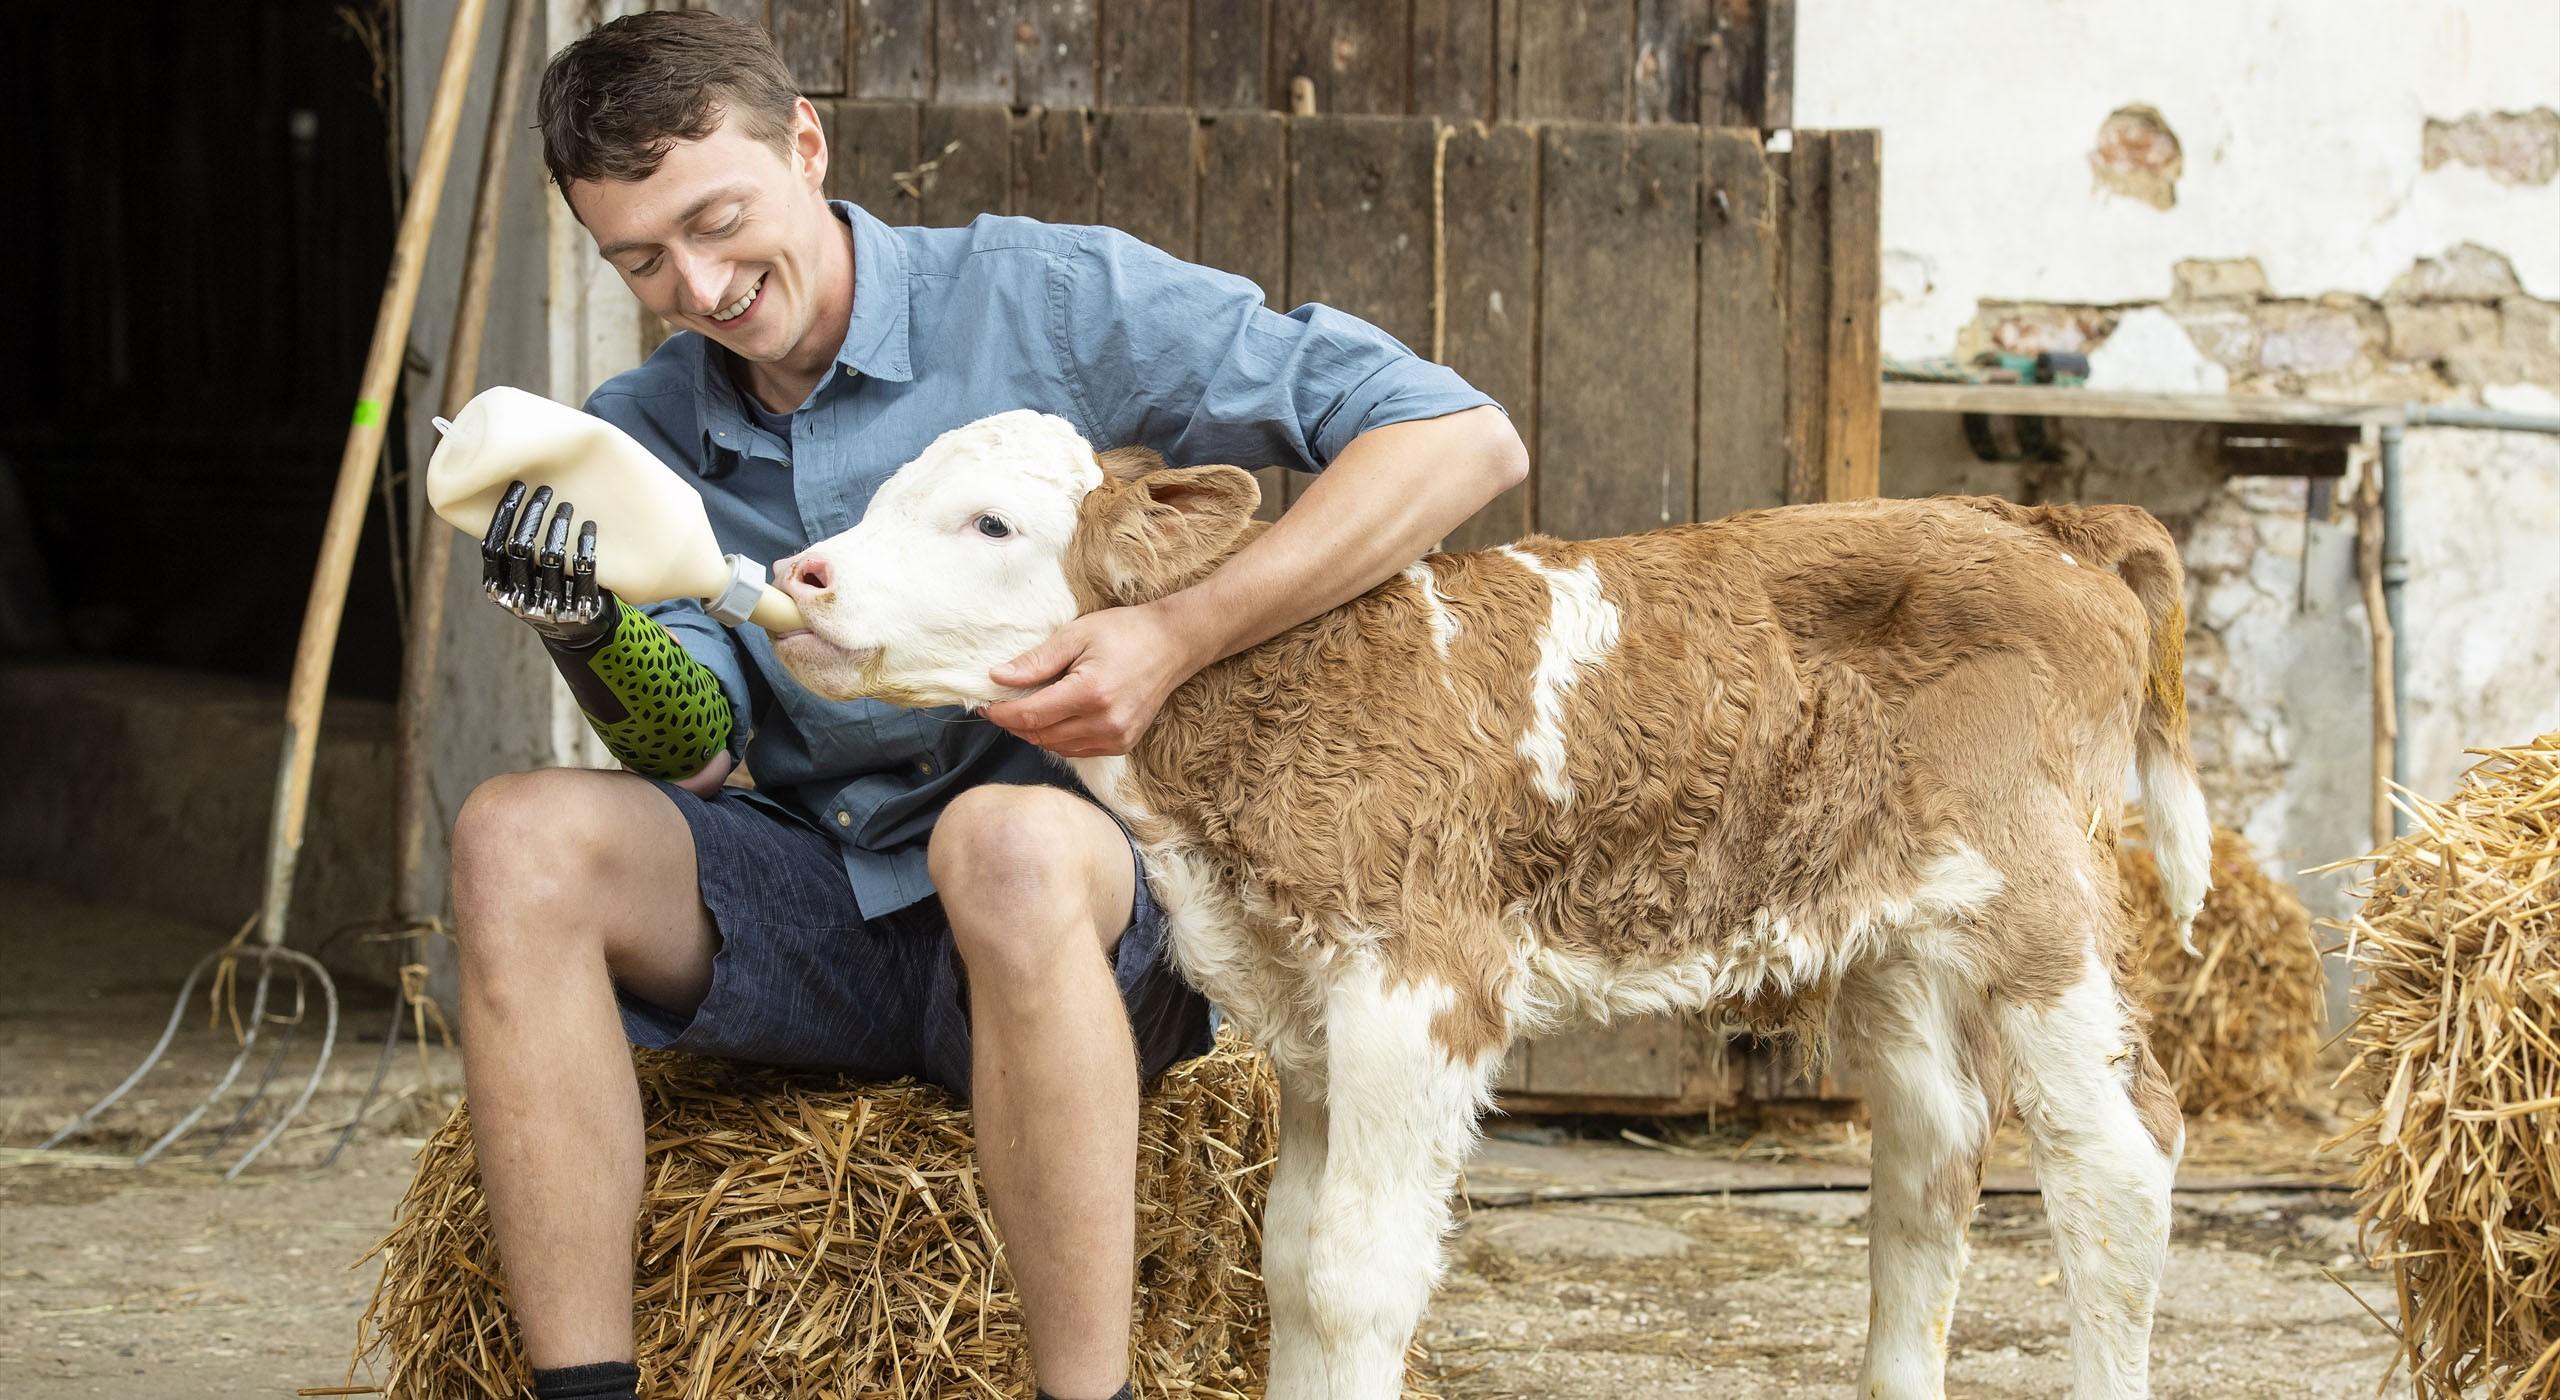 Junger Mann mit Armprothese füttert Schaf